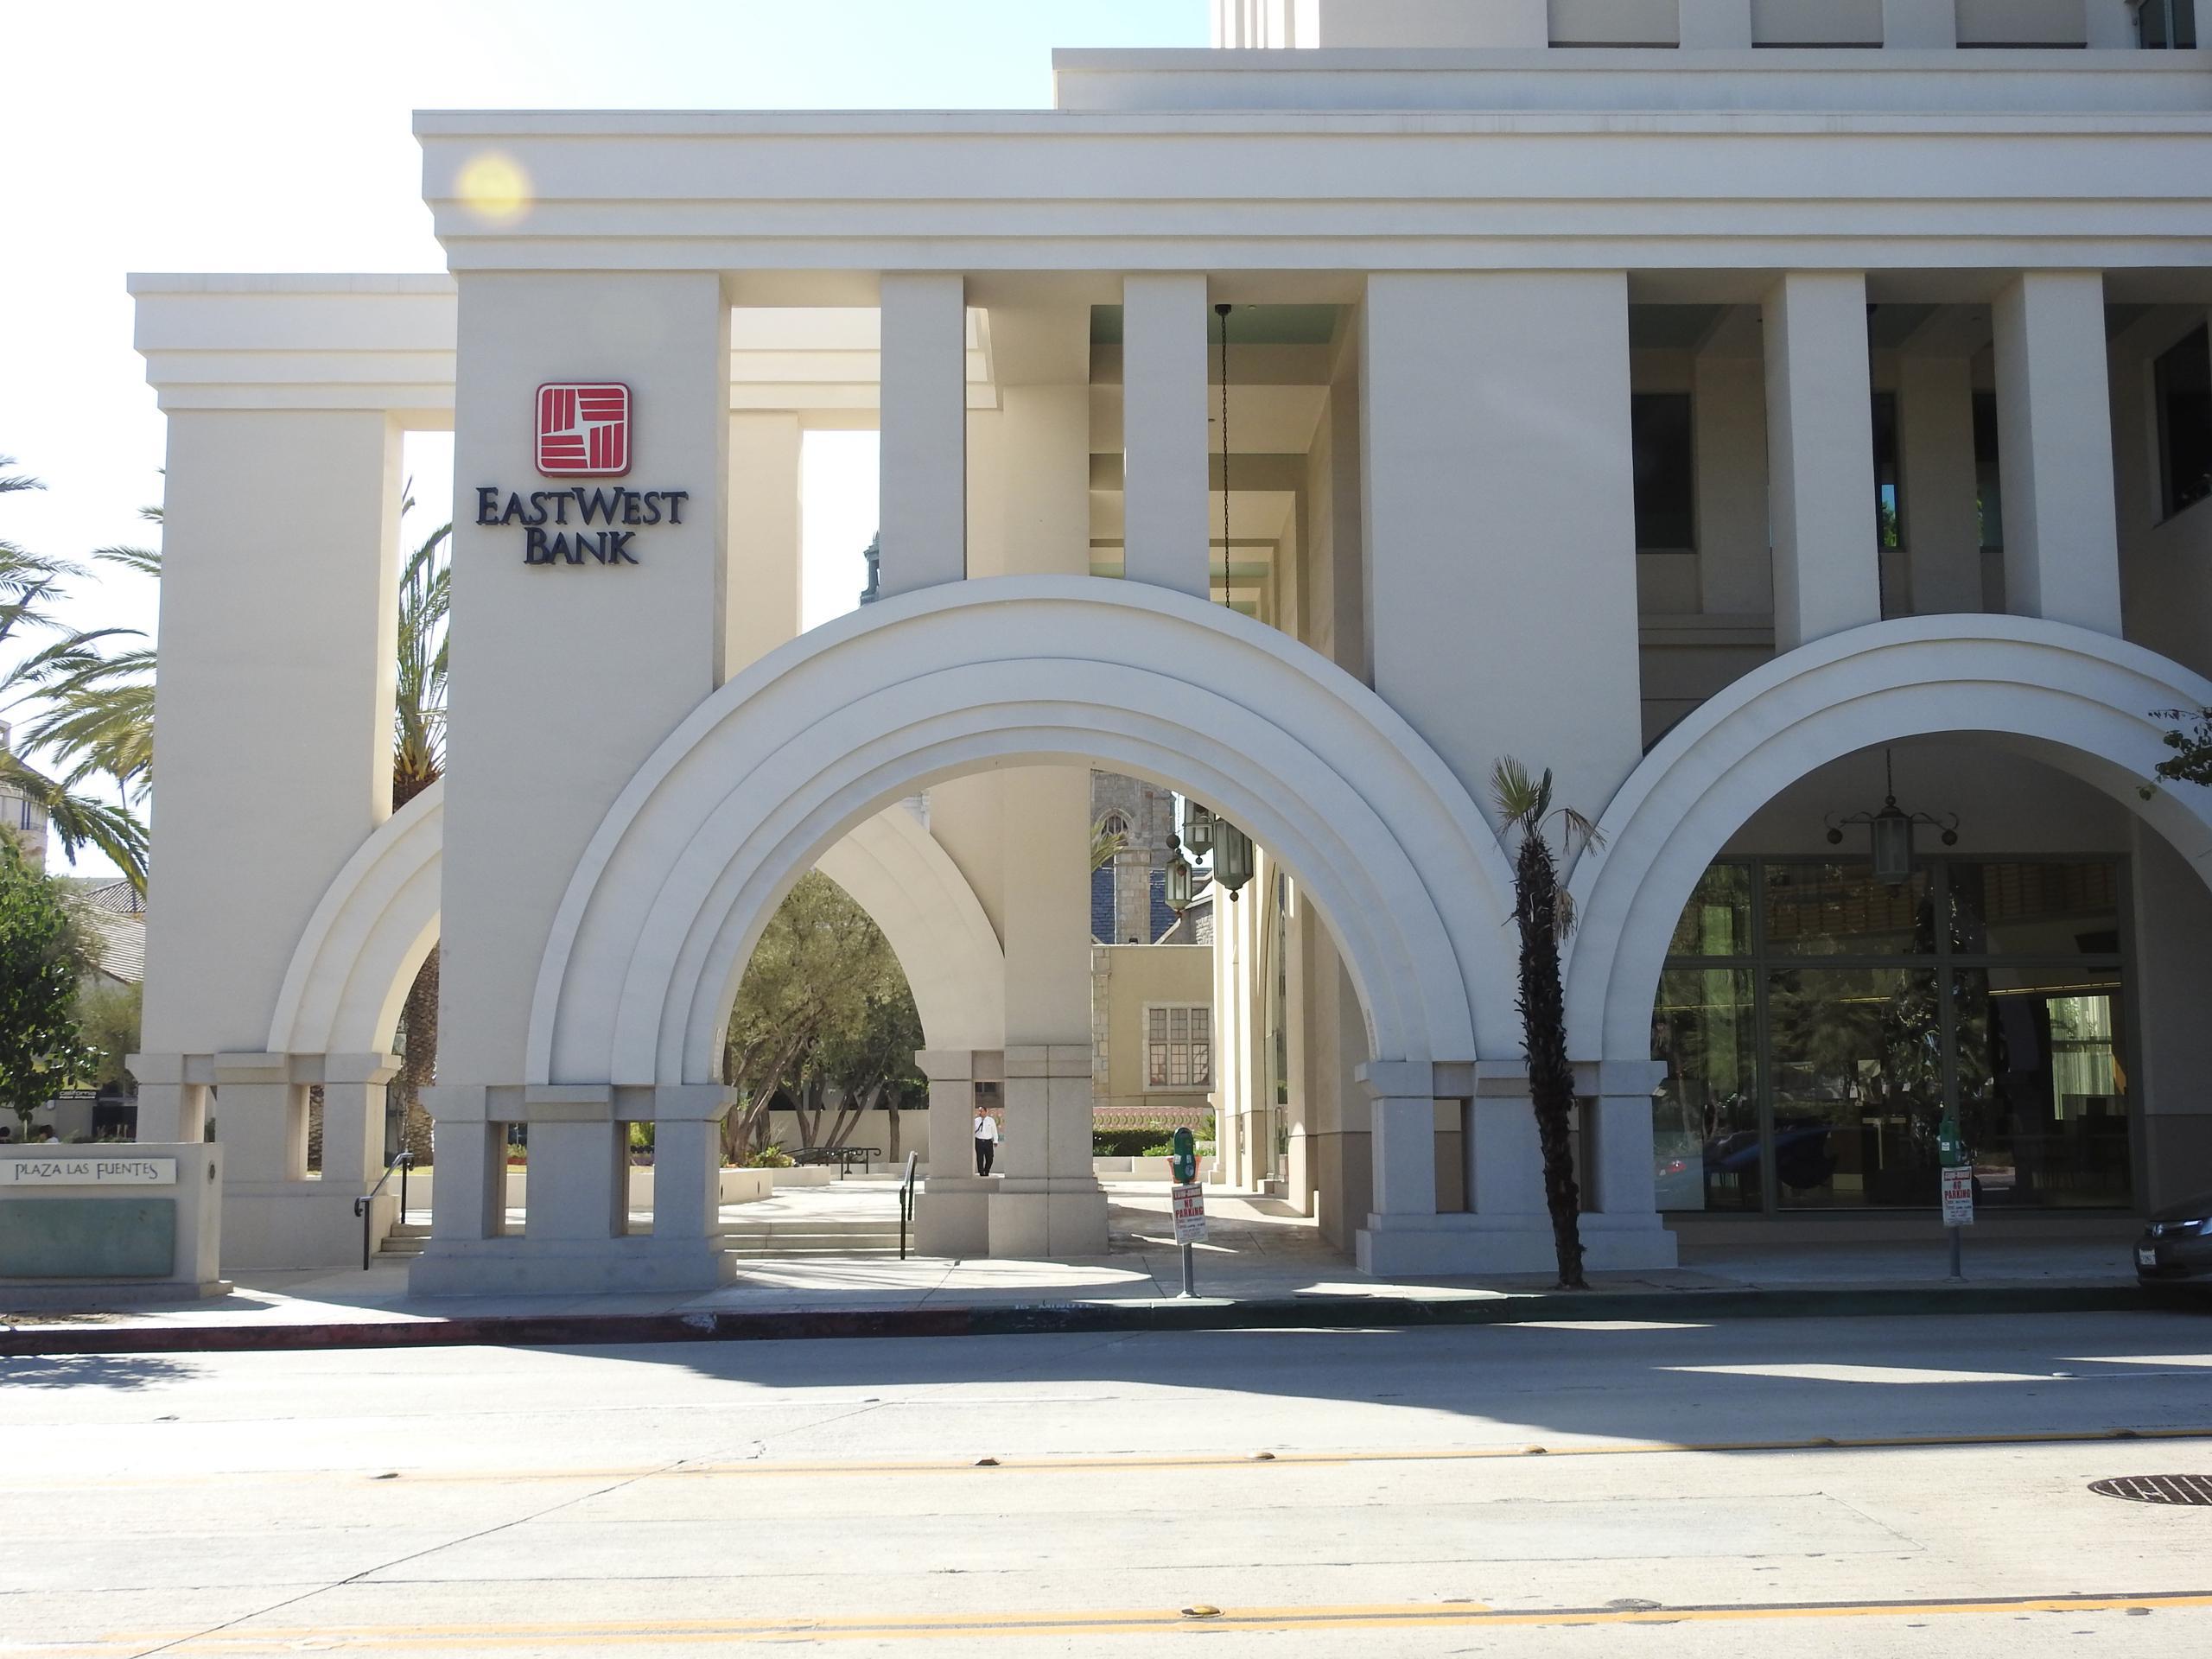 East West's corporate headquarters in Pasadena, California.